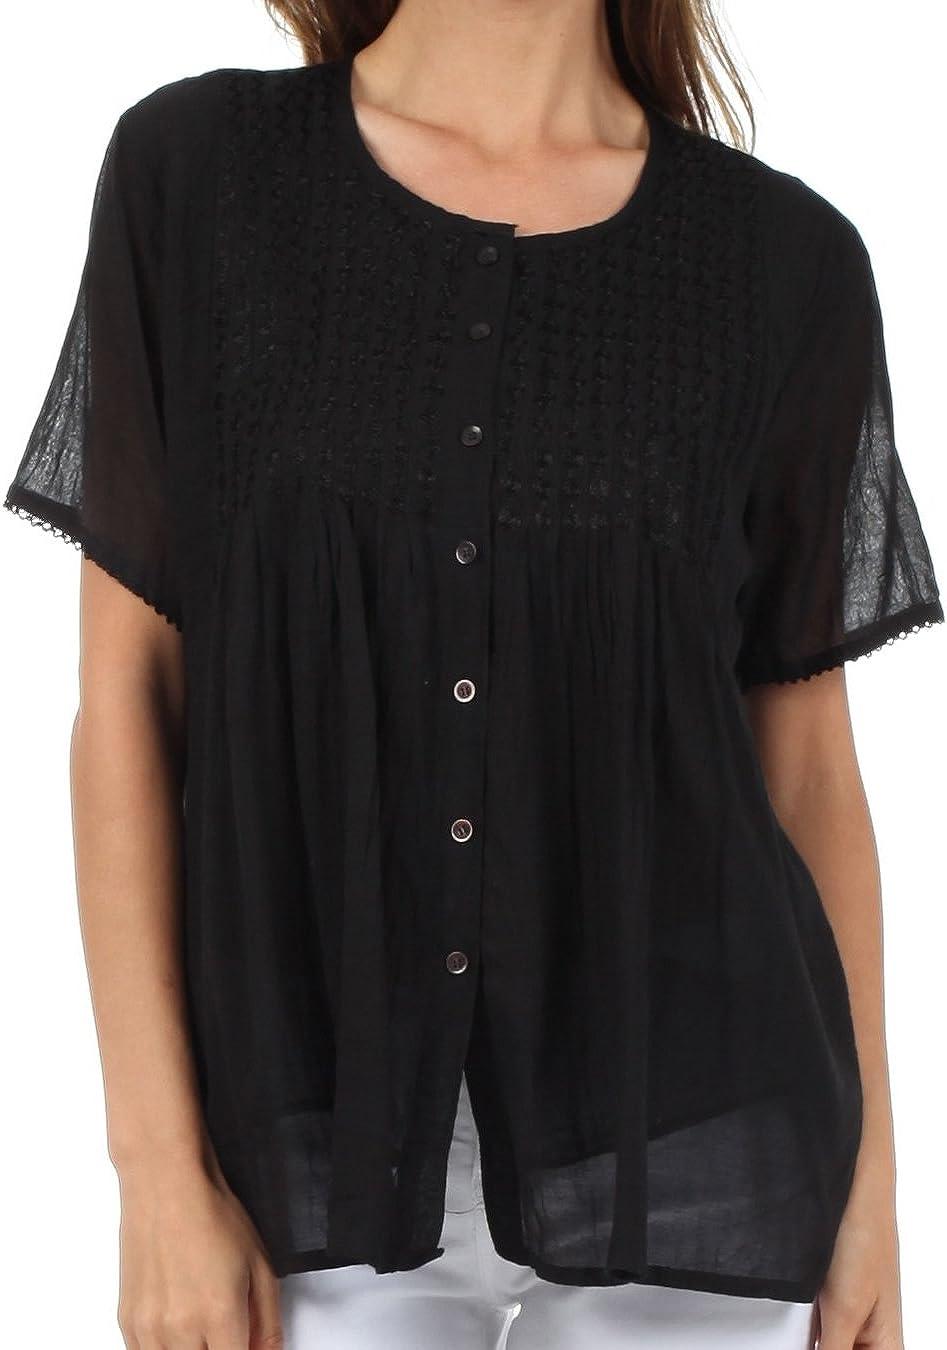 Sakkas Button Down Embroidered Baltimore Mall Short Semi-Sheer Gauzy Ranking TOP19 Sleeve Cot